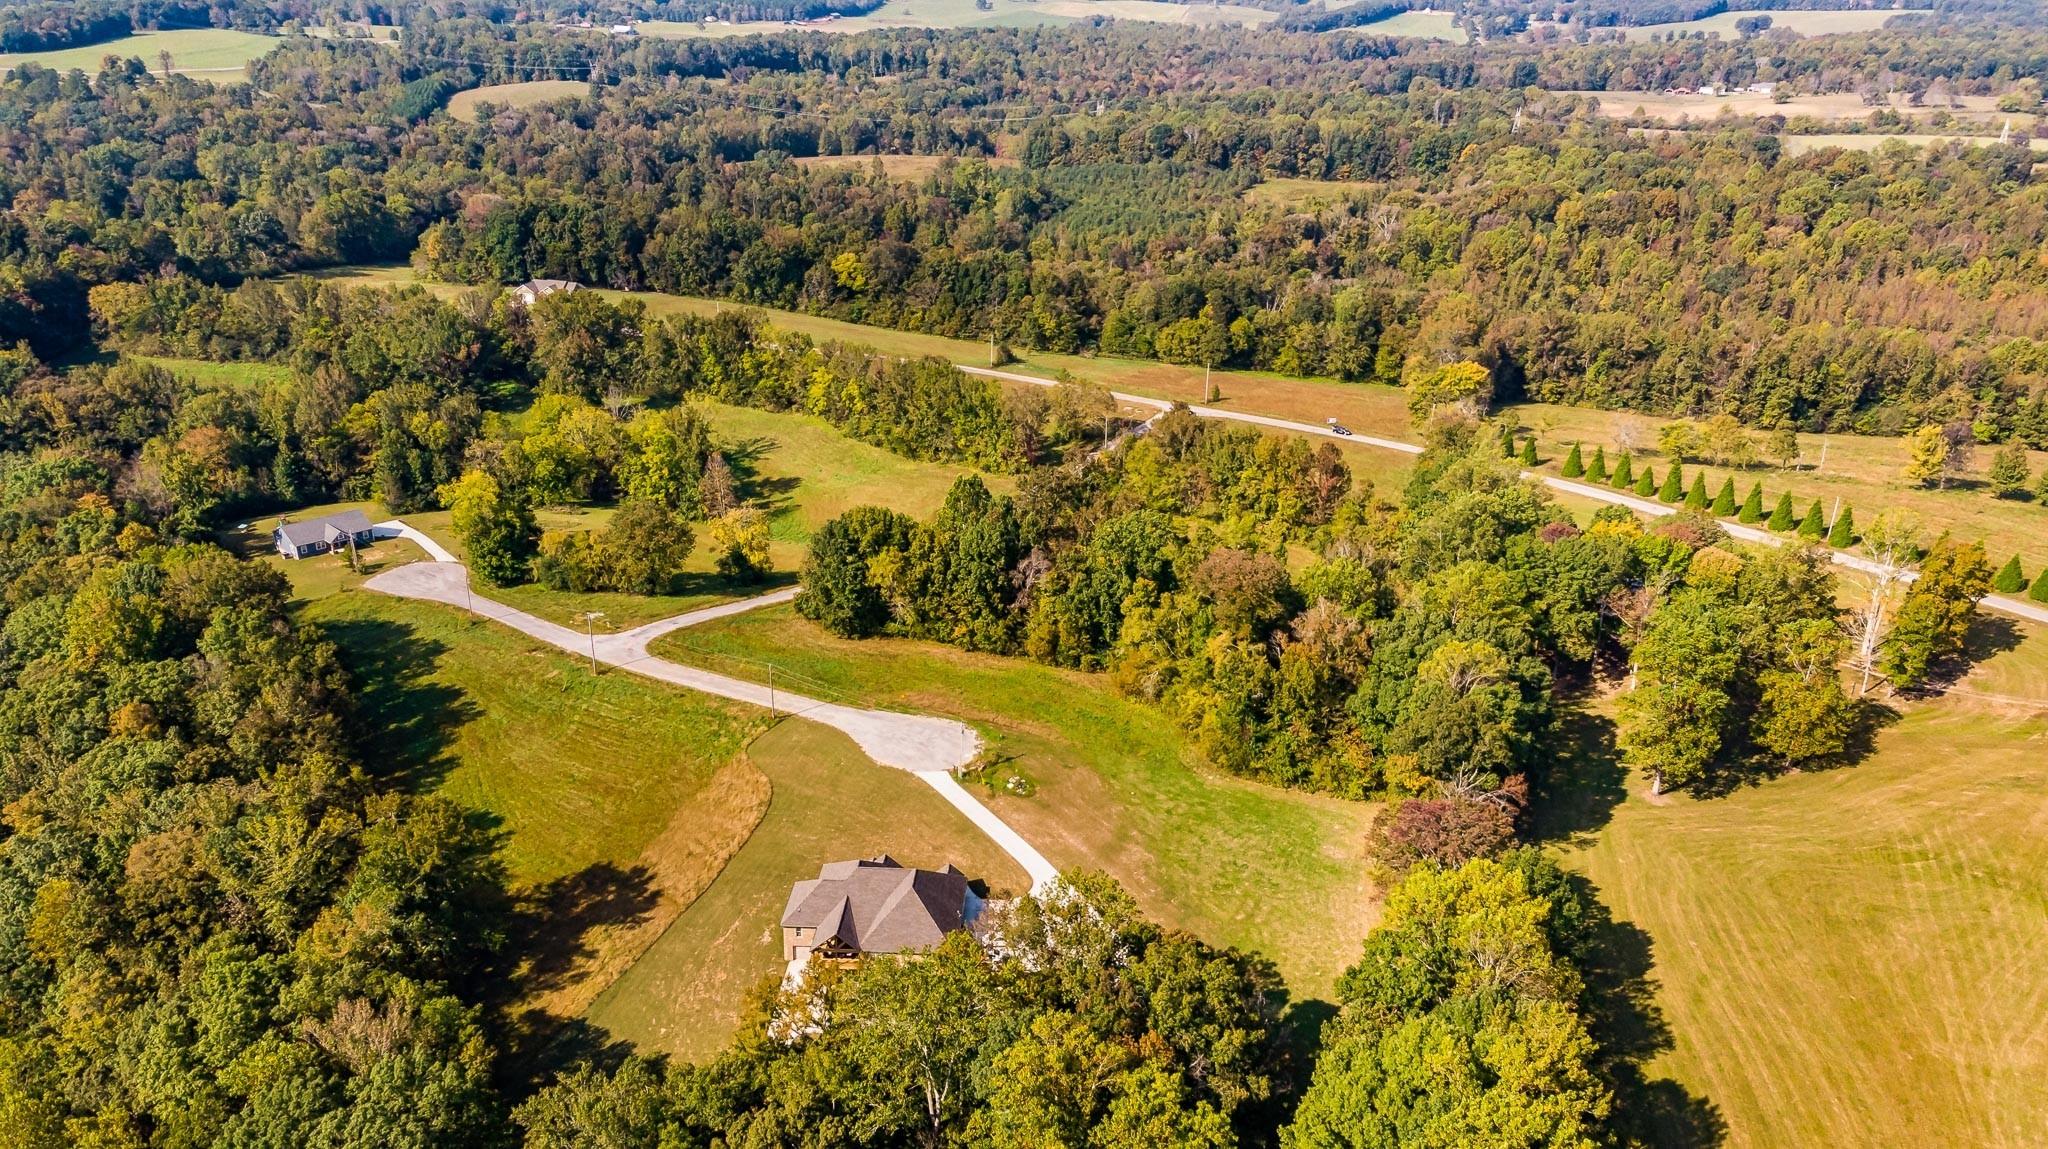 0 Tad Dr. Property Photo - Leoma, TN real estate listing